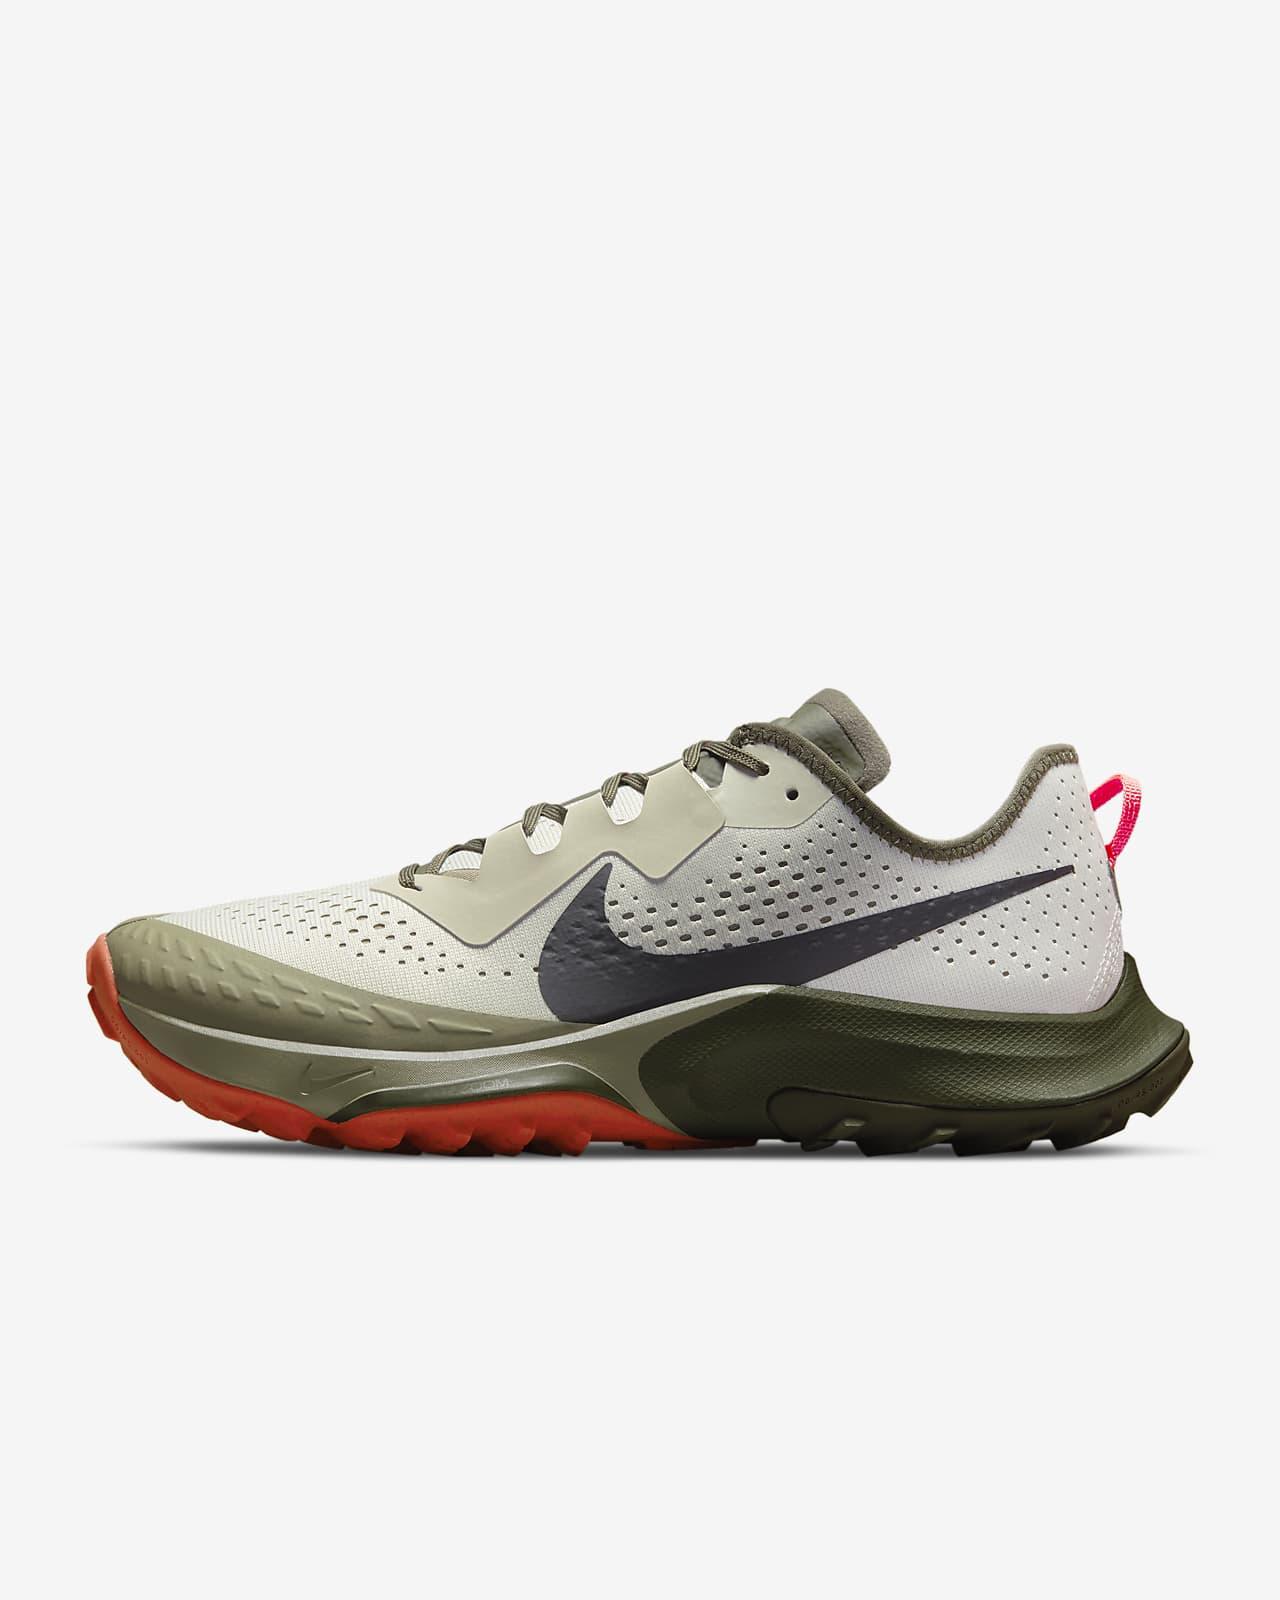 Sapatilhas de running para trilhos Nike Air Zoom Terra Kiger 7 para homem